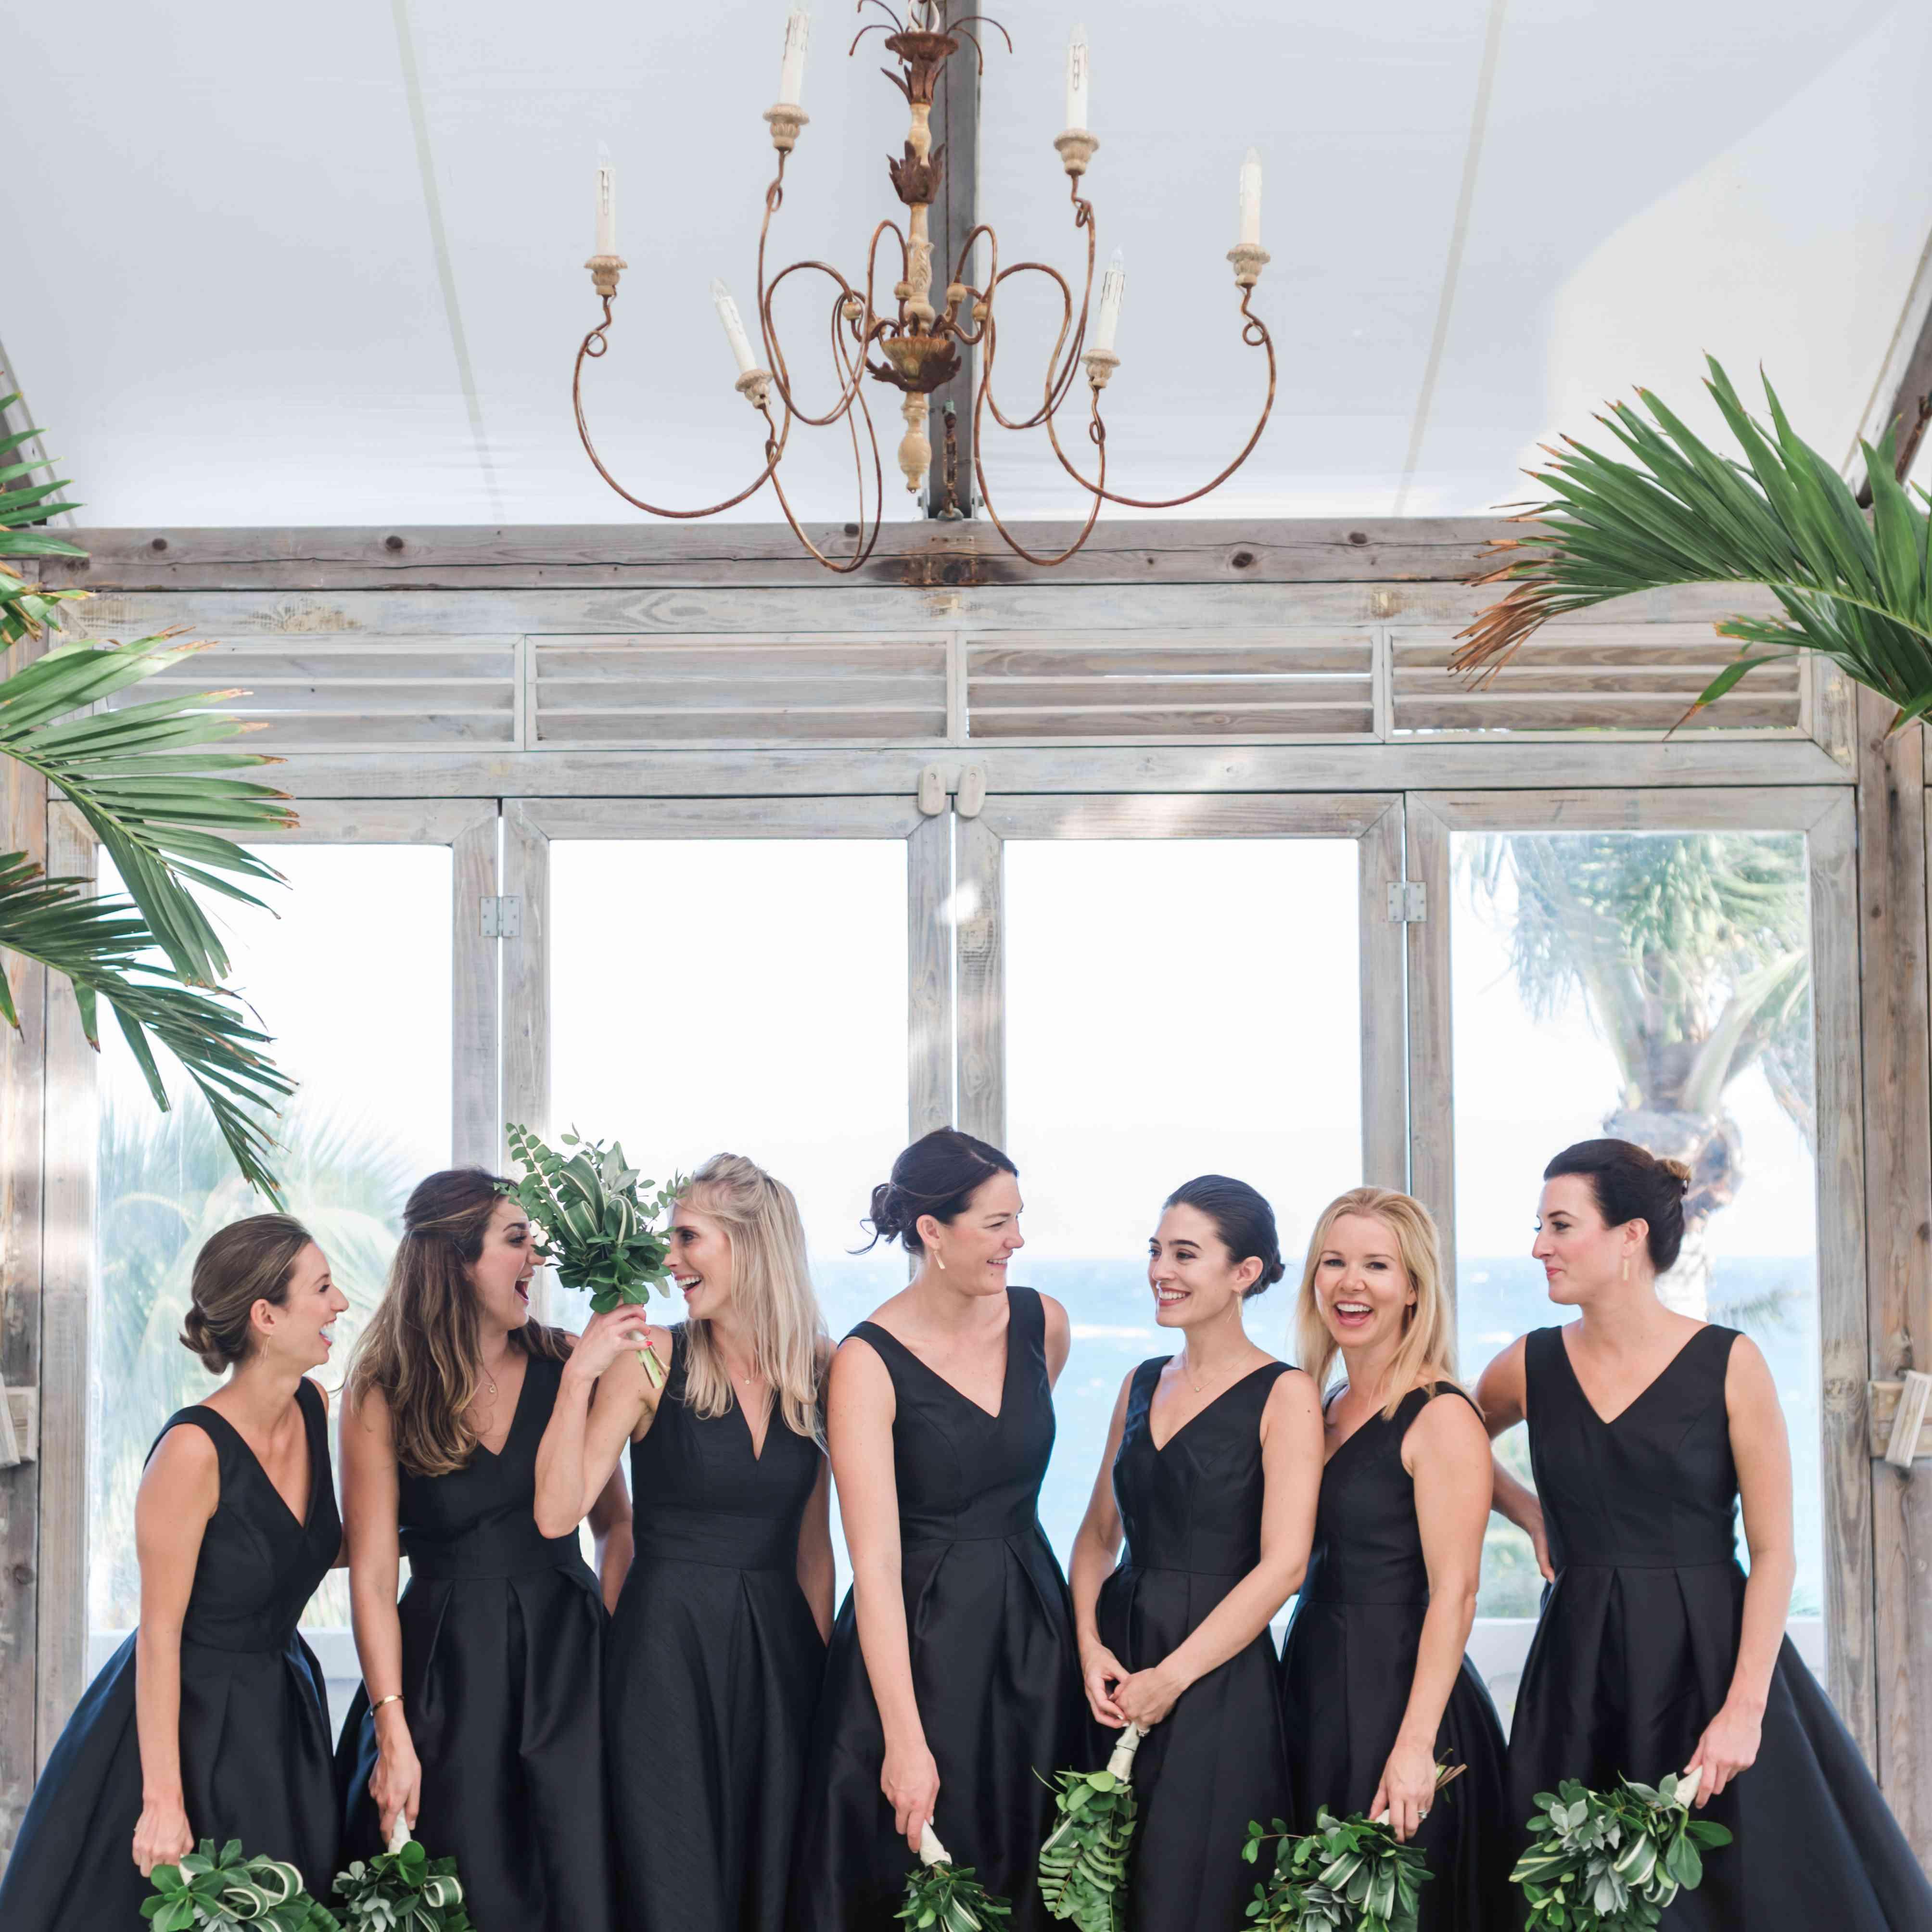 <p>black bridesmaid dresses</p><br><br>